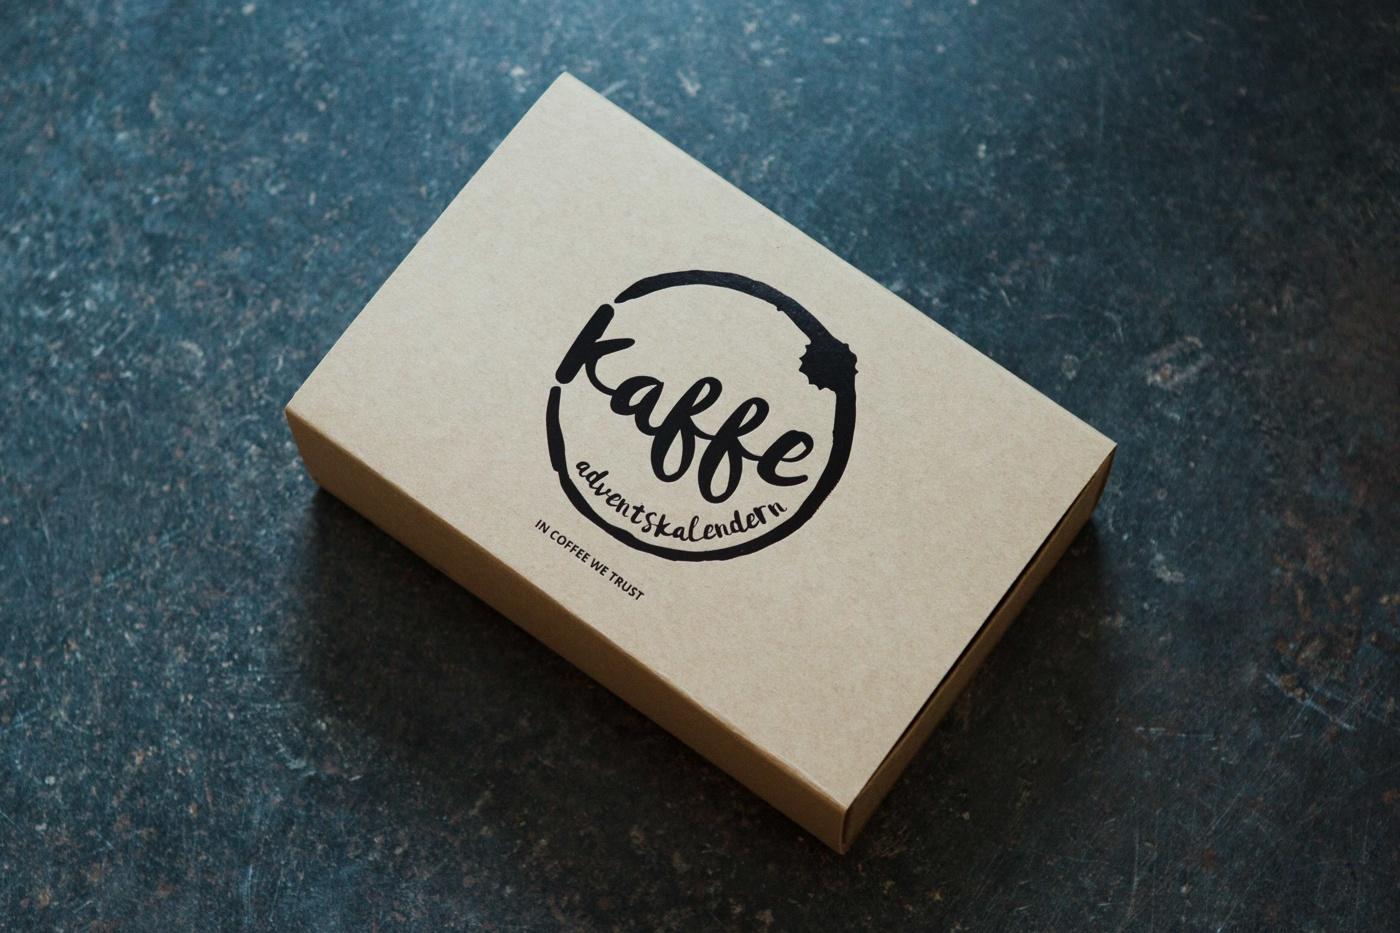 kaffeadventskalender